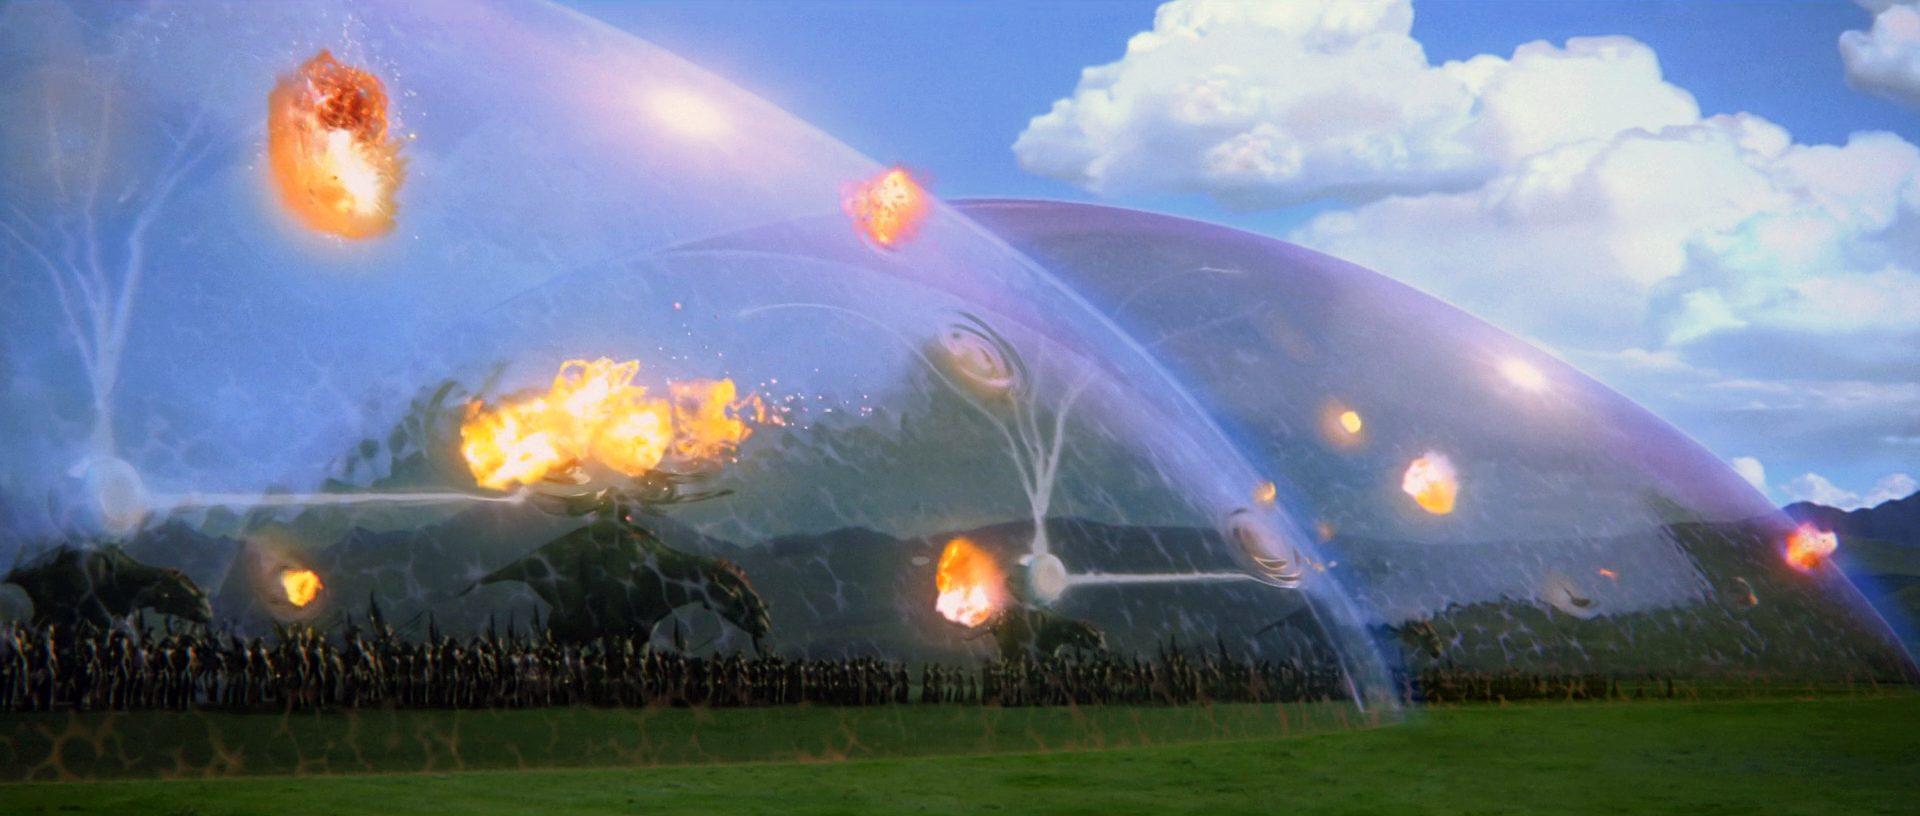 Star Wars plot holes - gungan shield